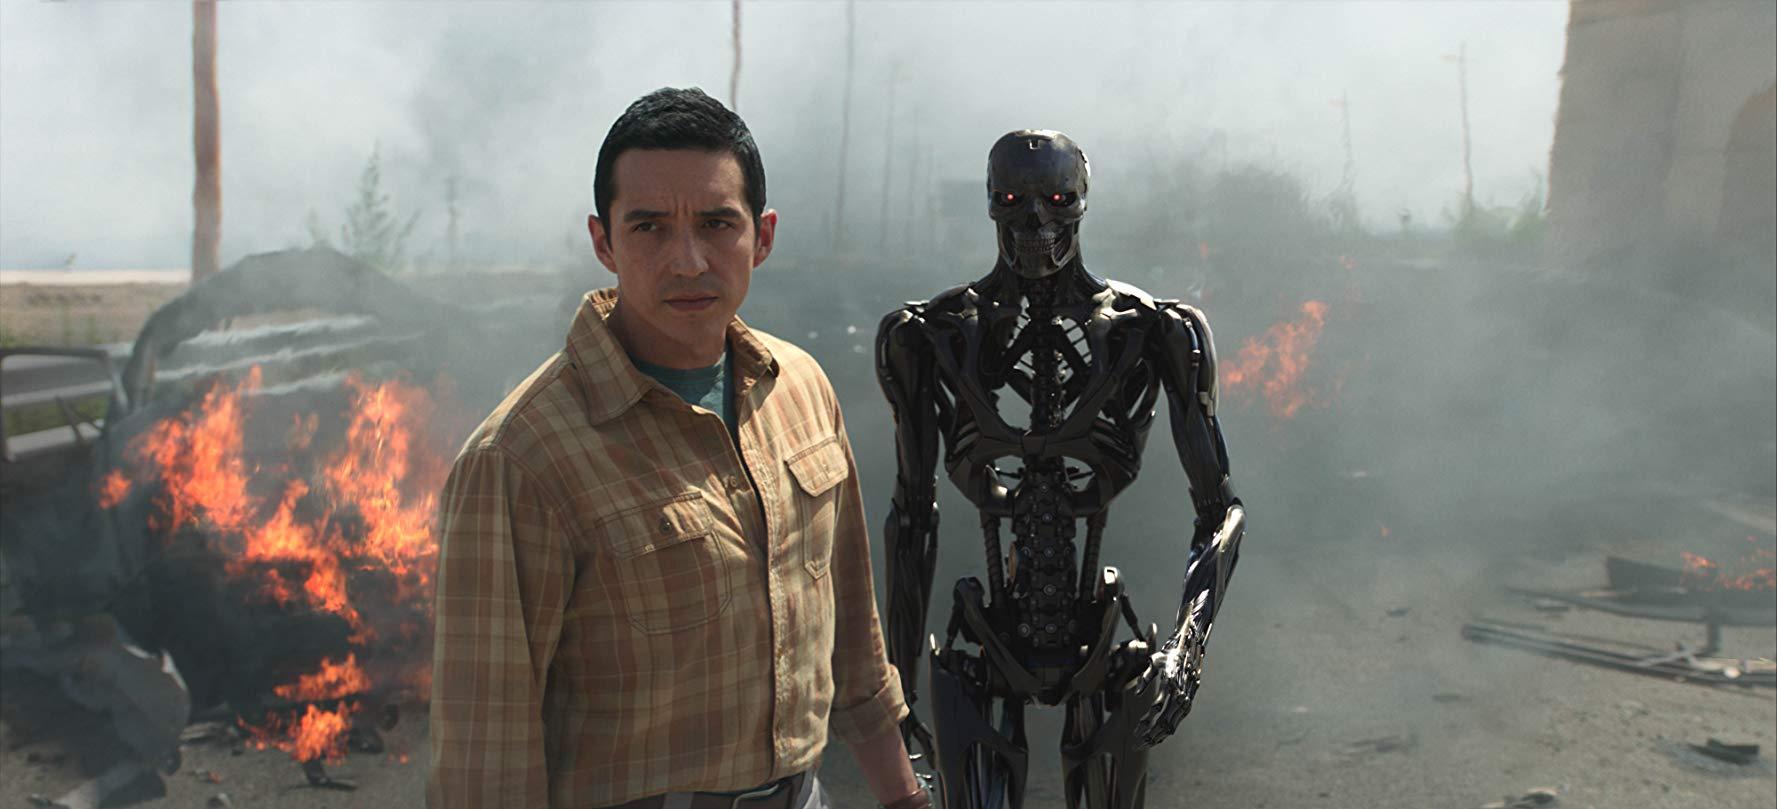 tt1 - New Terminator: Dark Fate Shows Sarah Connor is Back as BadAss Fighter.